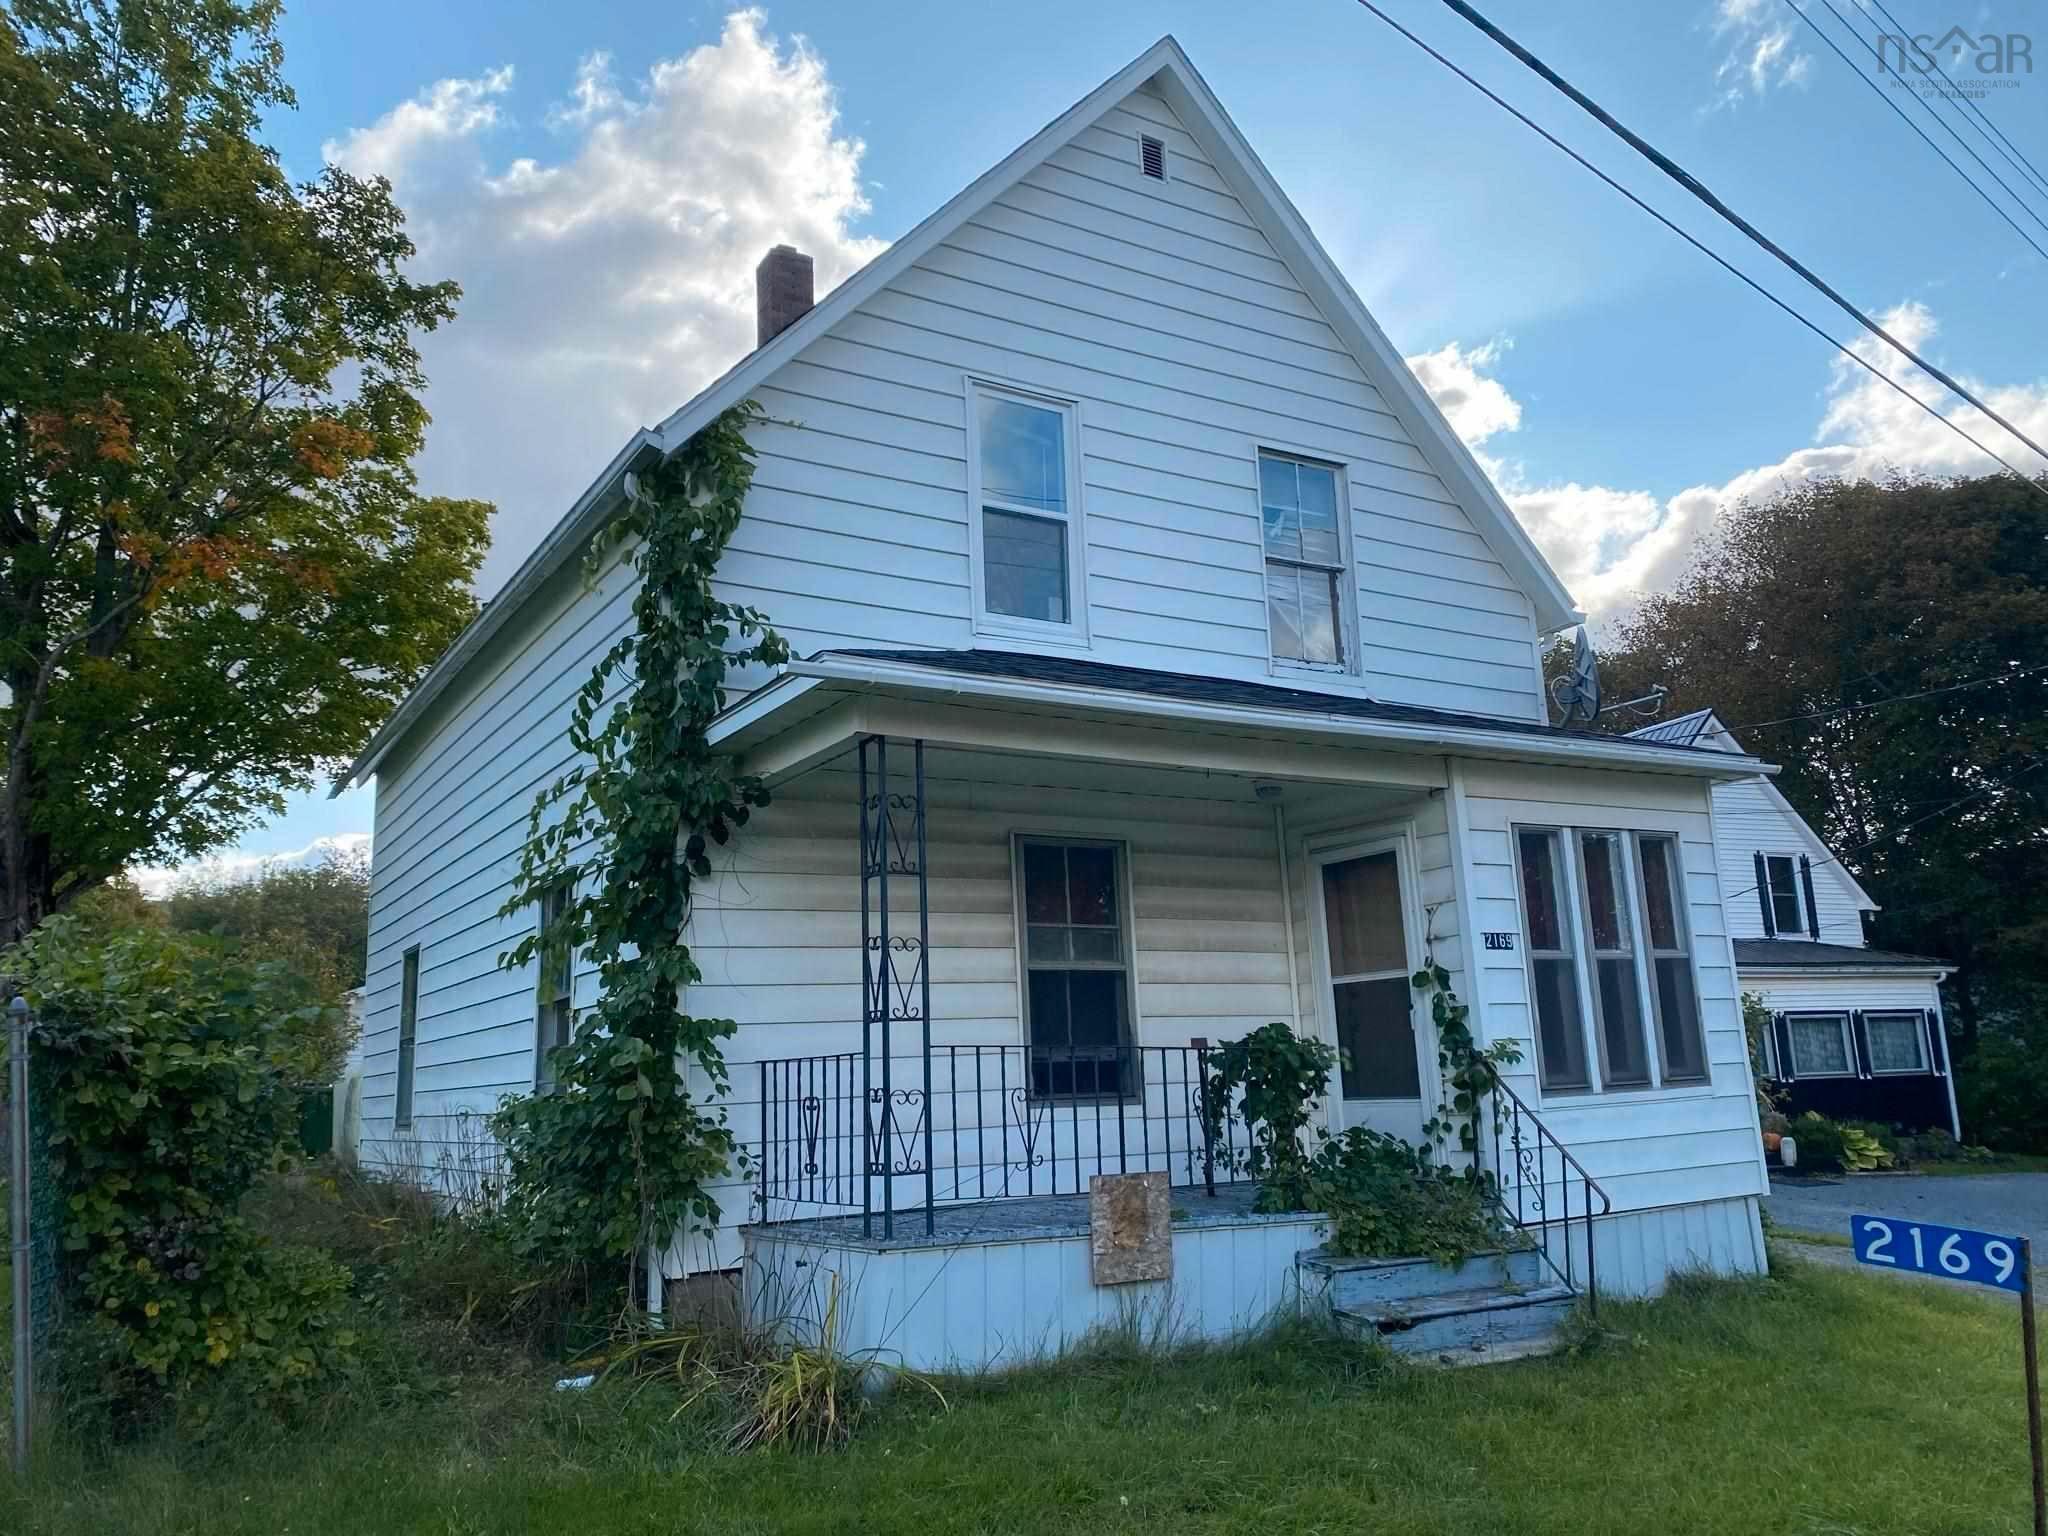 Main Photo: 2169 Church Street in Westville: 107-Trenton,Westville,Pictou Residential for sale (Northern Region)  : MLS®# 202125552